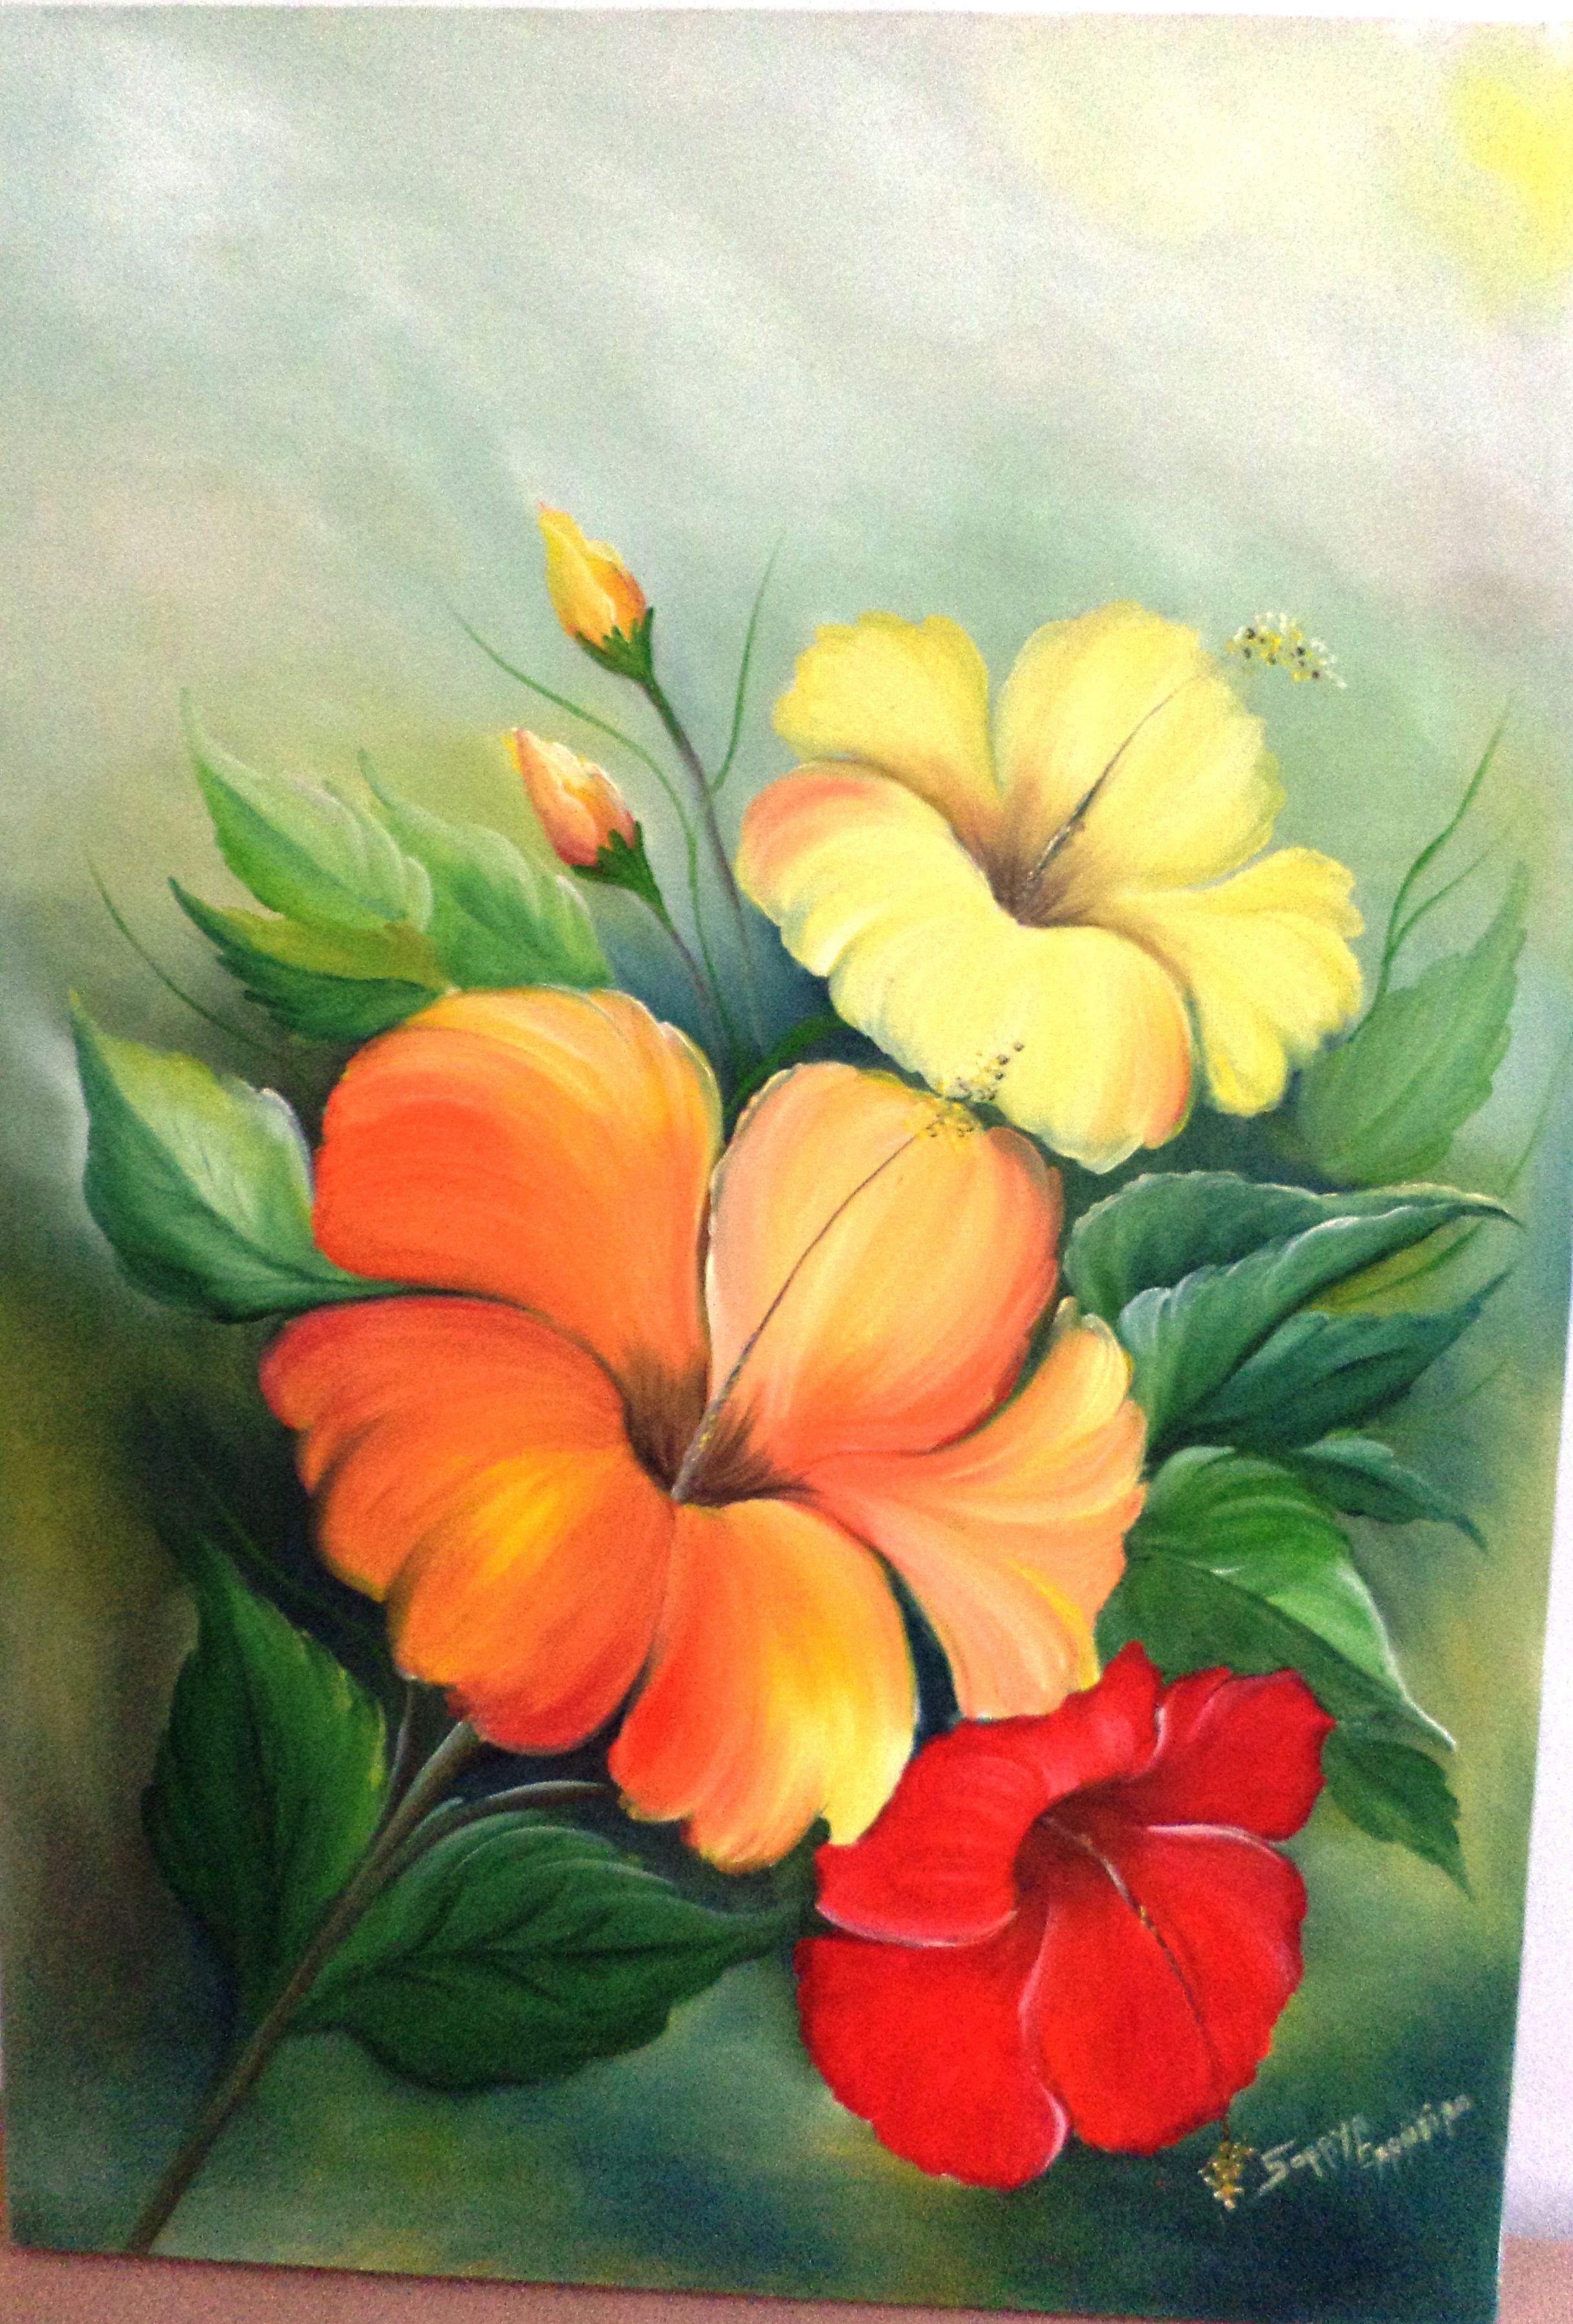 leo sobre tela  dibujo y arte  Pinterest  Flowers Paintings